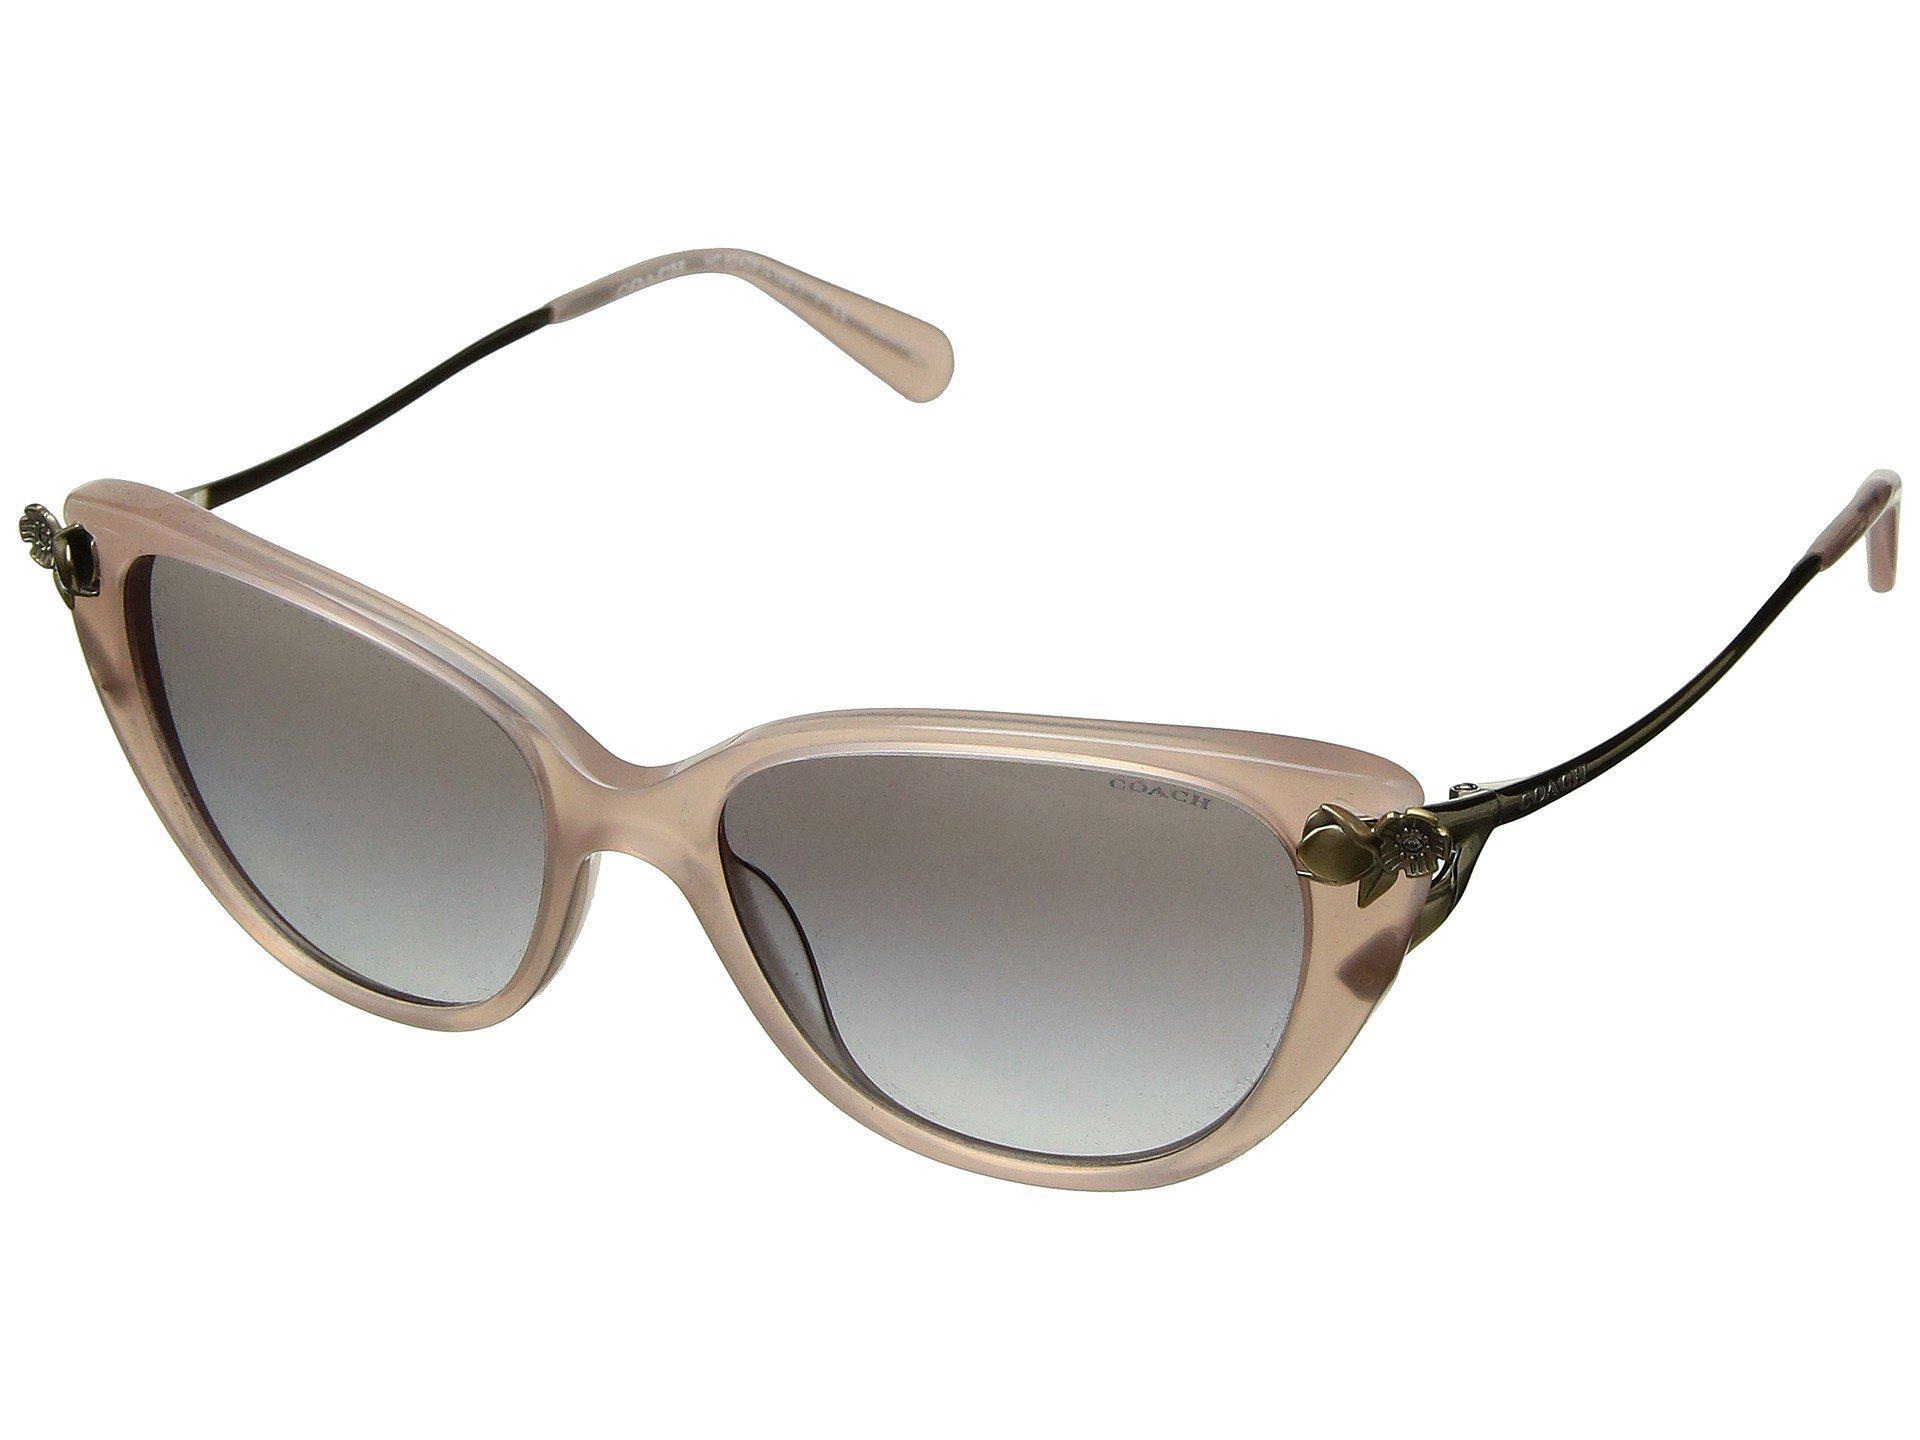 d55c68475b purchase coach other authentic coach aviator sunglasses 9586e bce2d  buy  lyst coach 0hc8242b milky pink blush grey gradient fashion 77771 78c6c